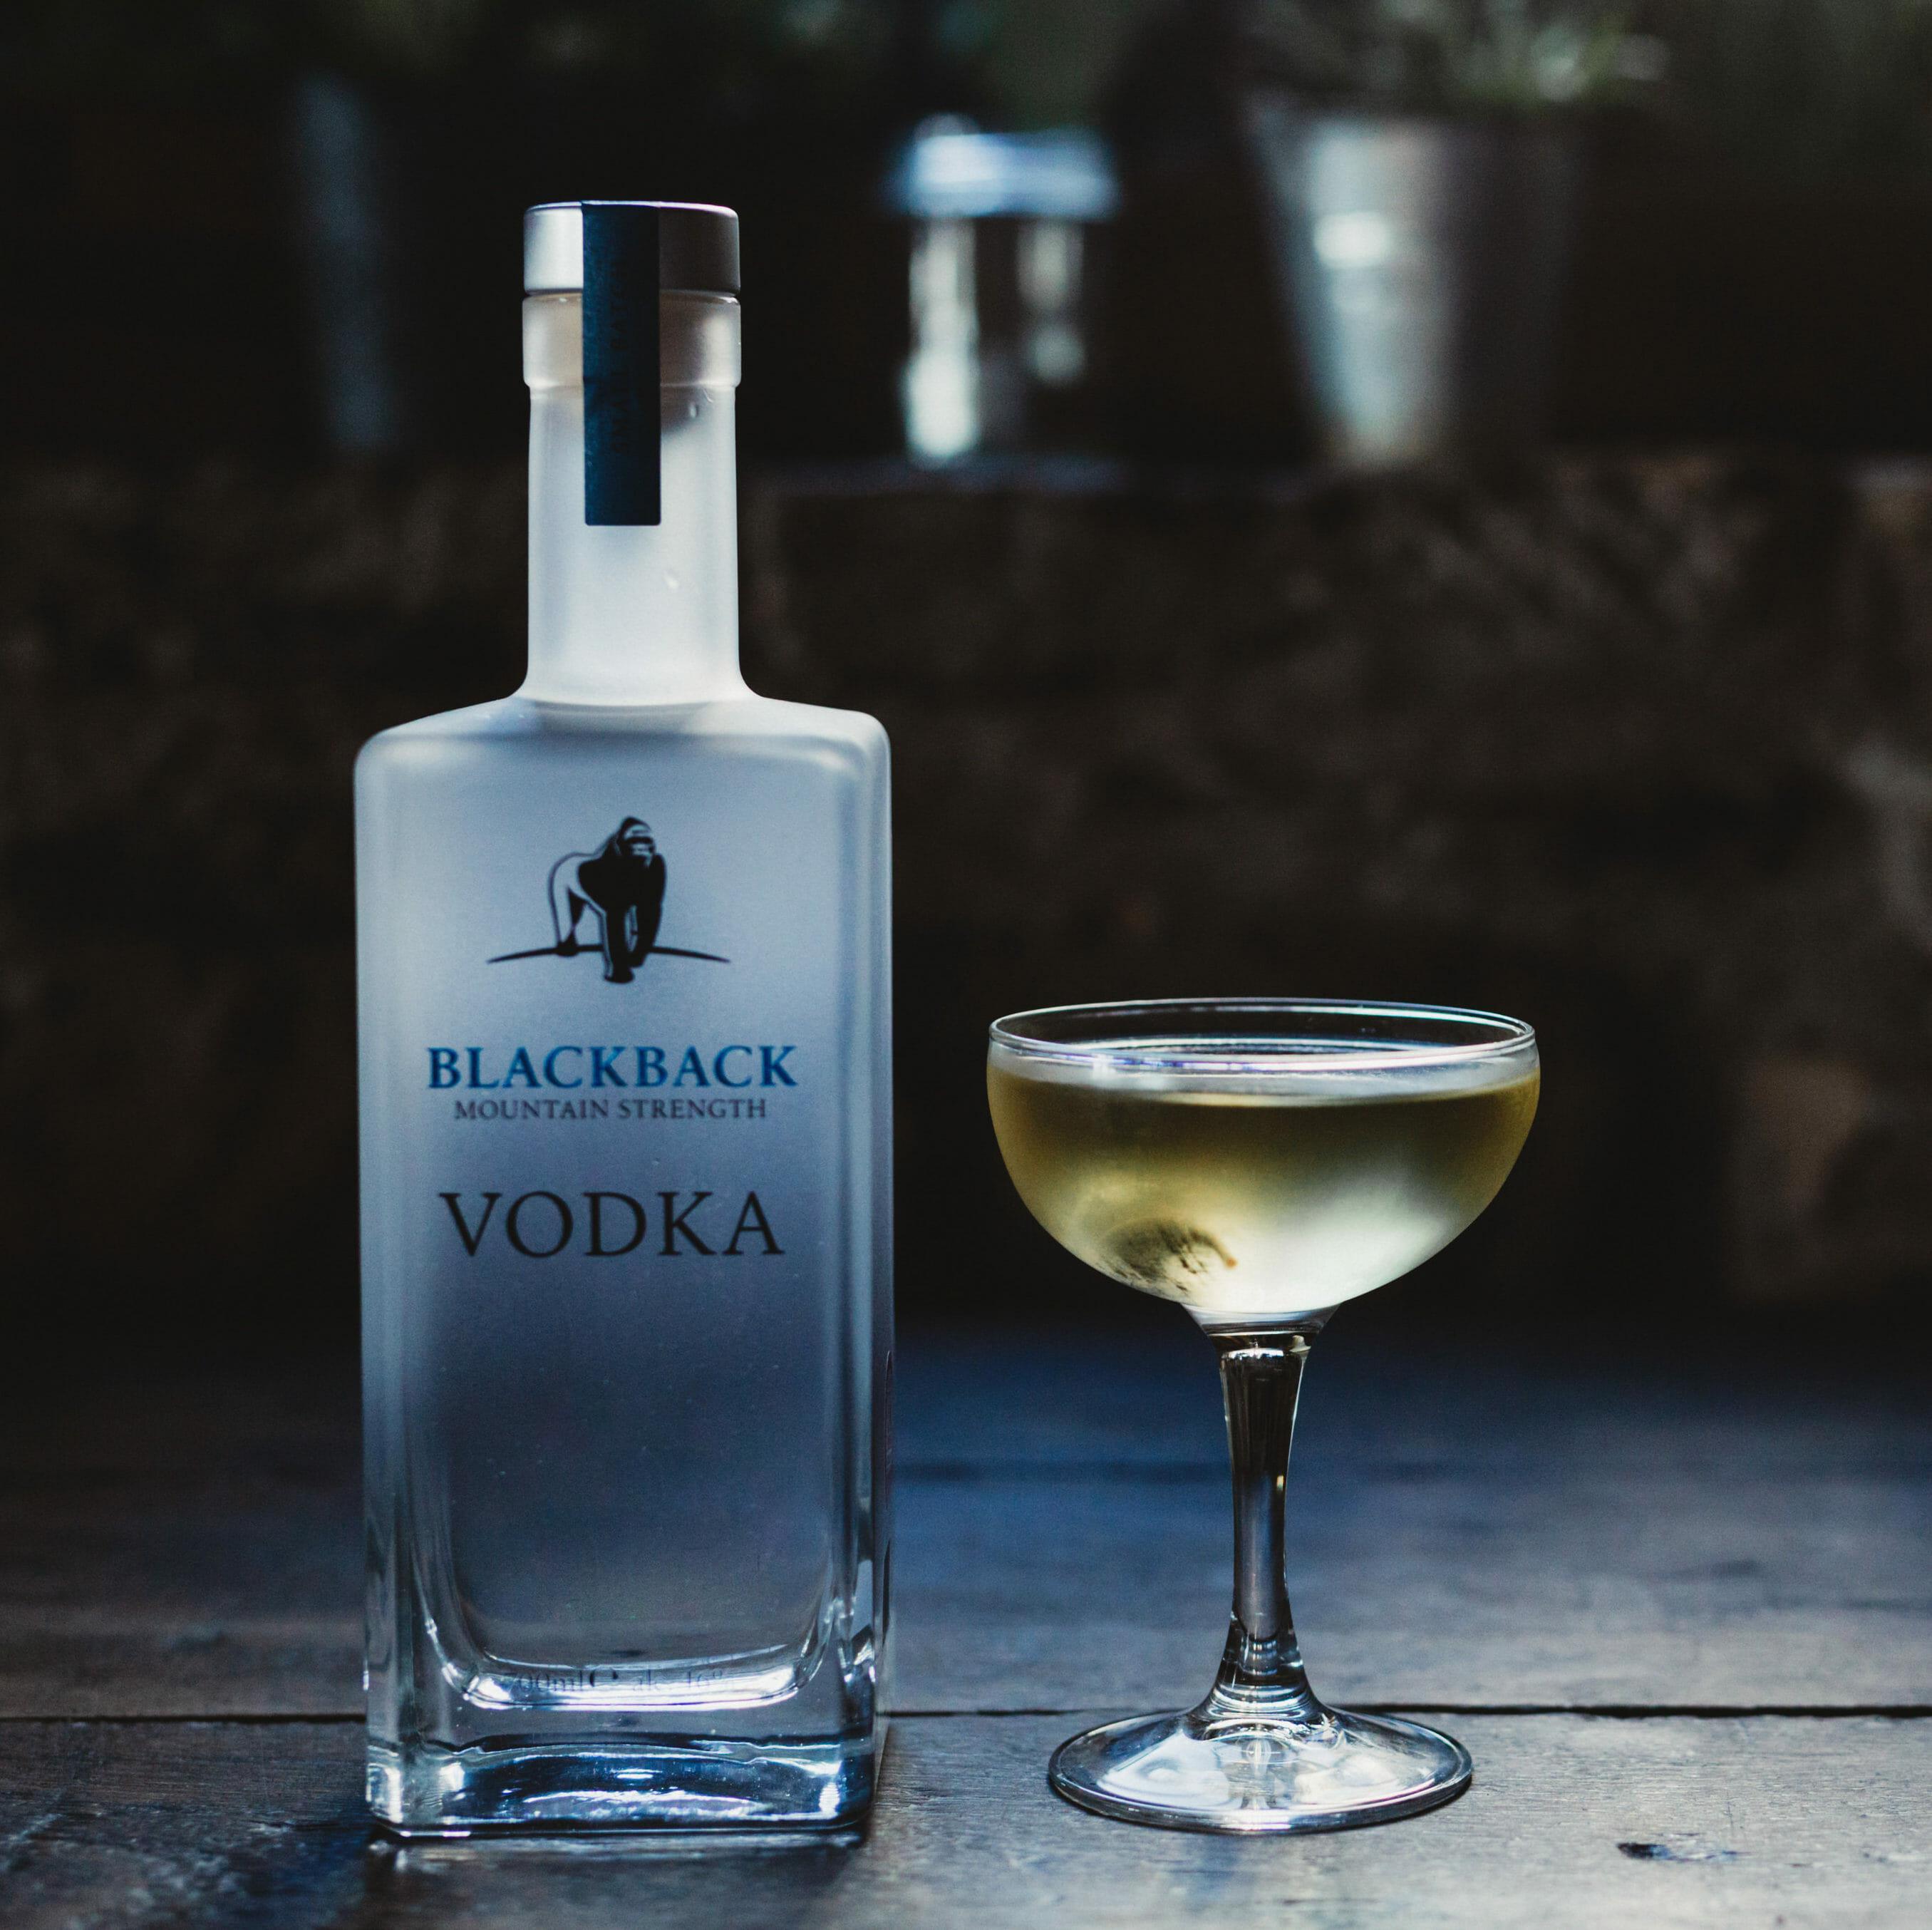 Blackback Mountain Strength Vodka bottle alongside signature martini - Gorilla Spirits Co.